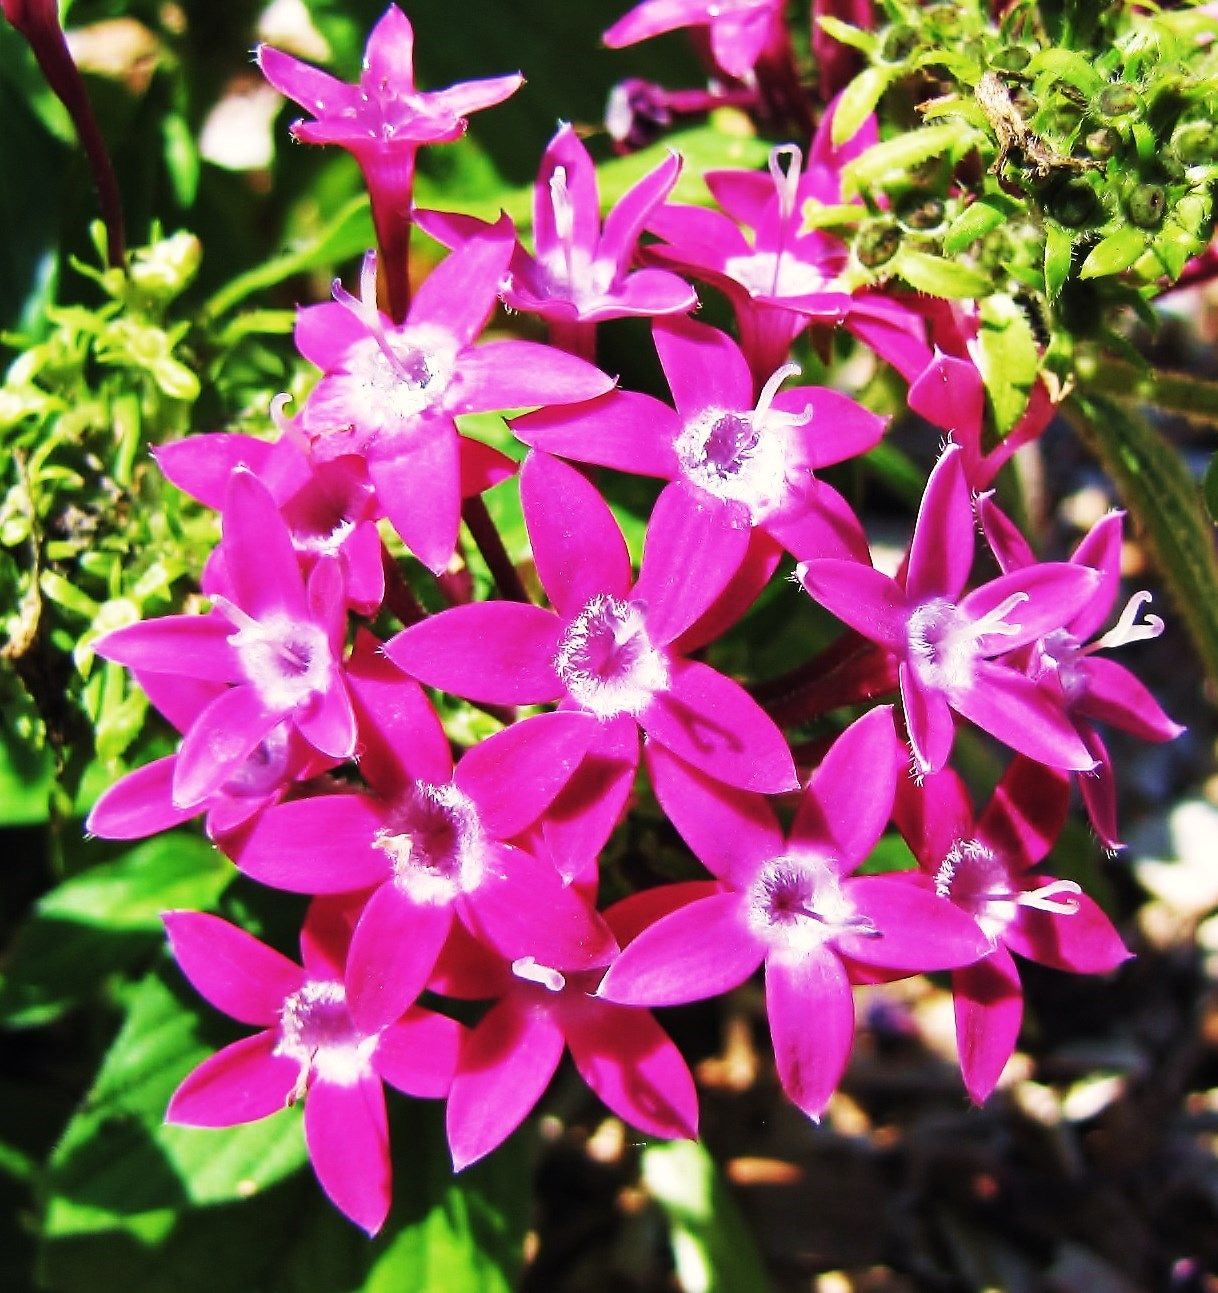 Penta S Star Flowers Fuchsia Florida Flowers Flowers Photo